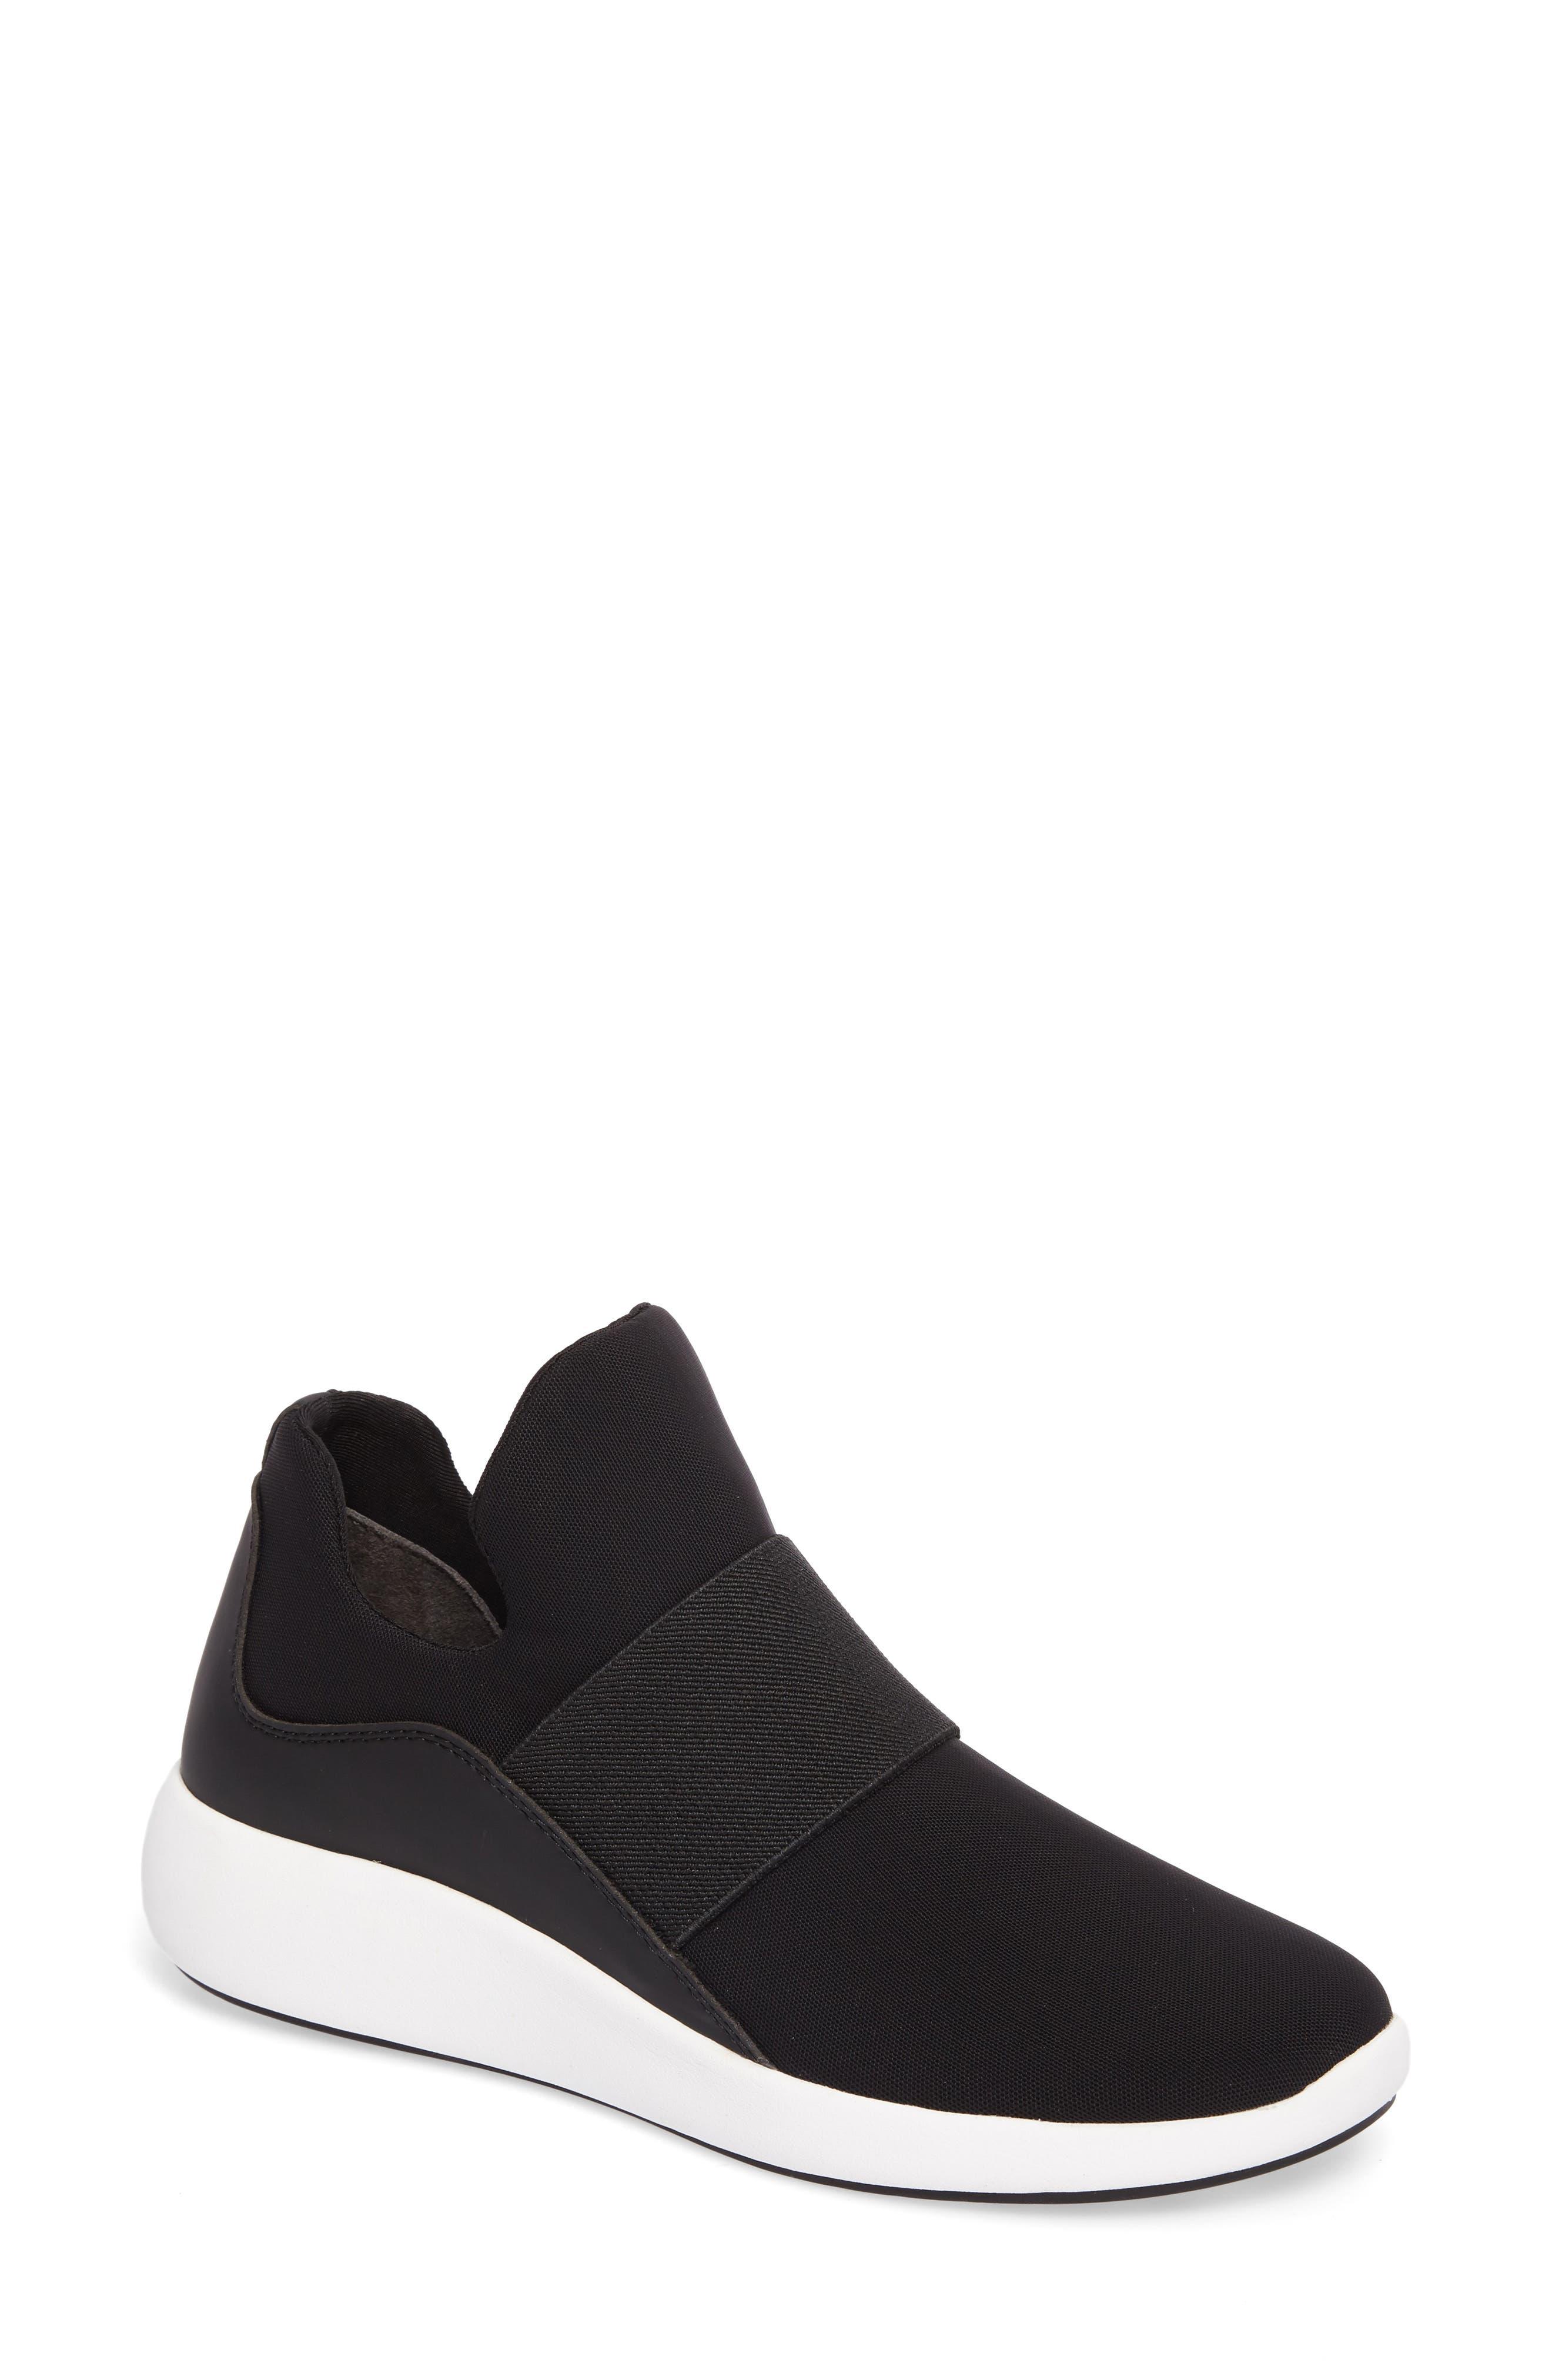 Donna Karan Cory Slip-On Sneaker,                         Main,                         color, 001